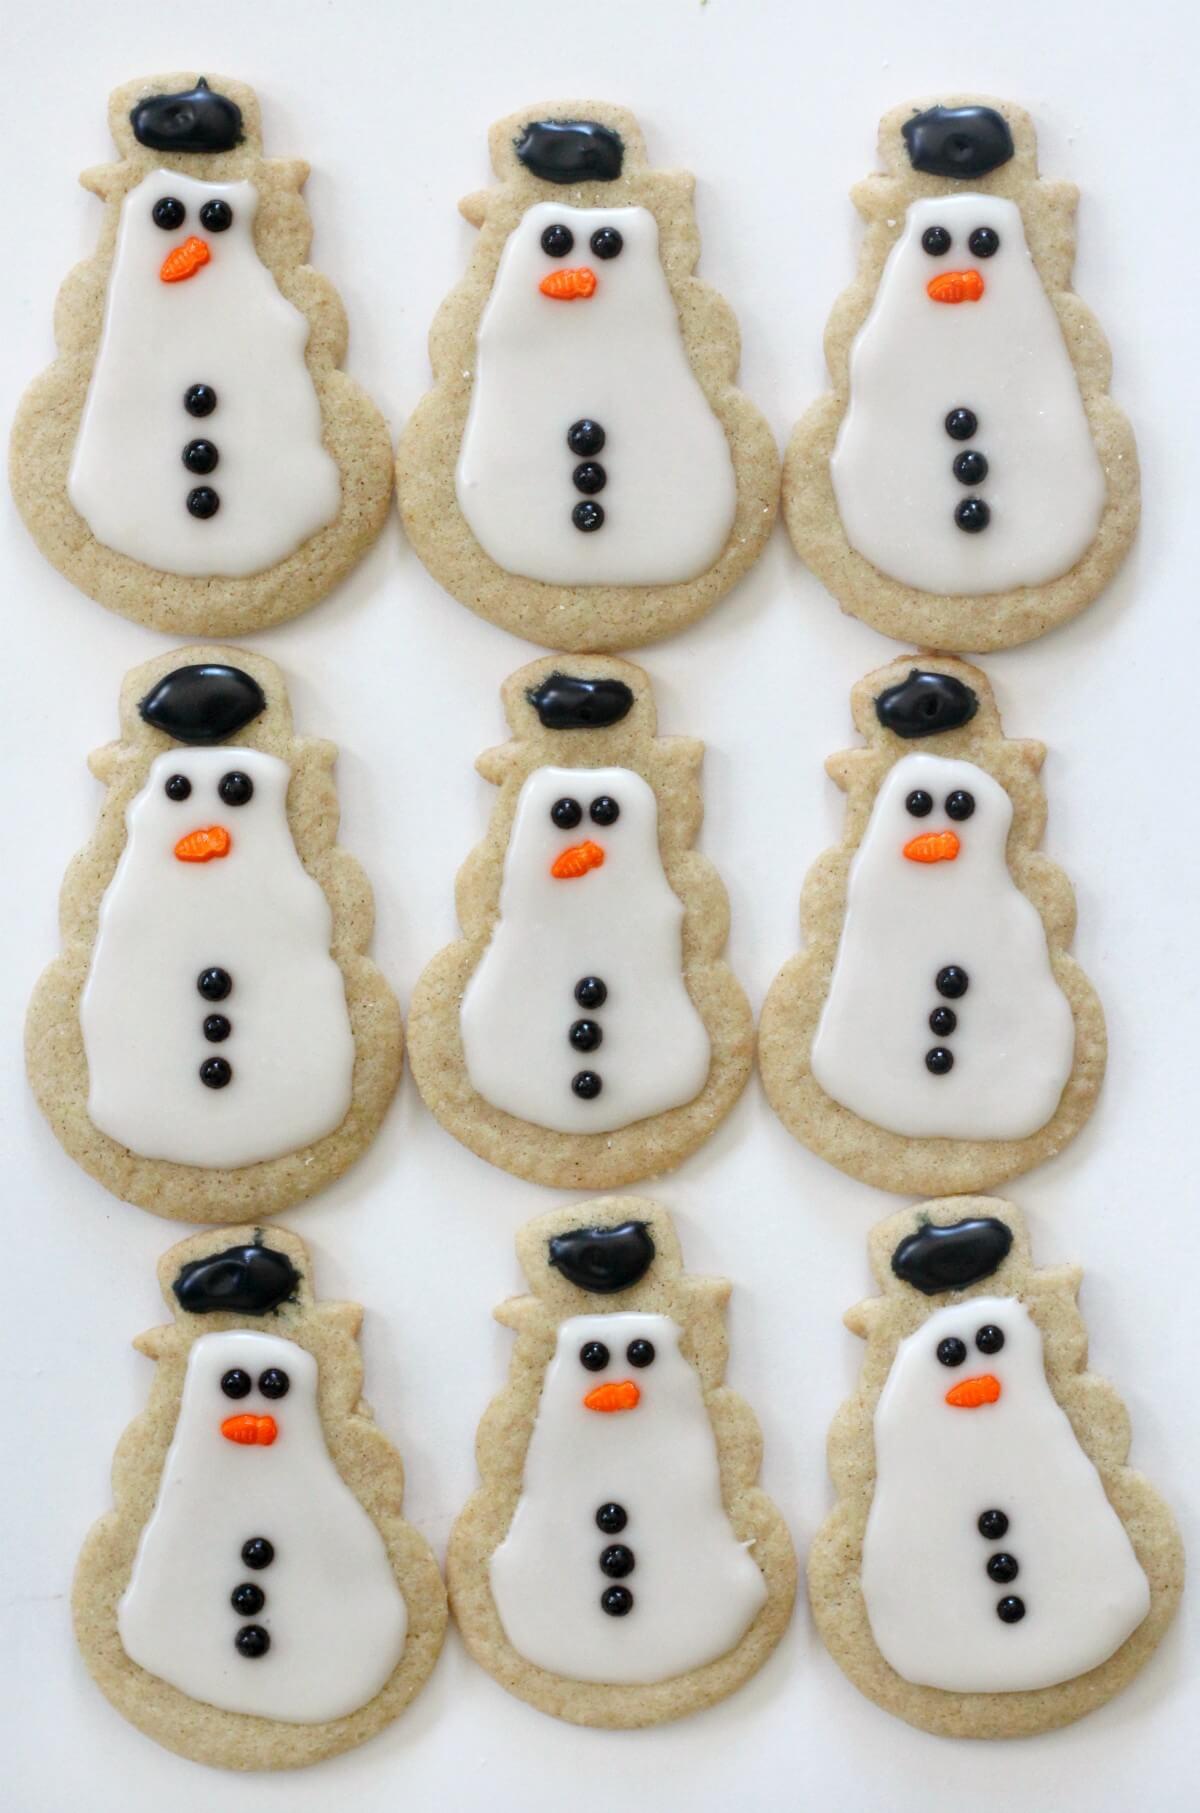 nine gluten-free snowman sugar cookies